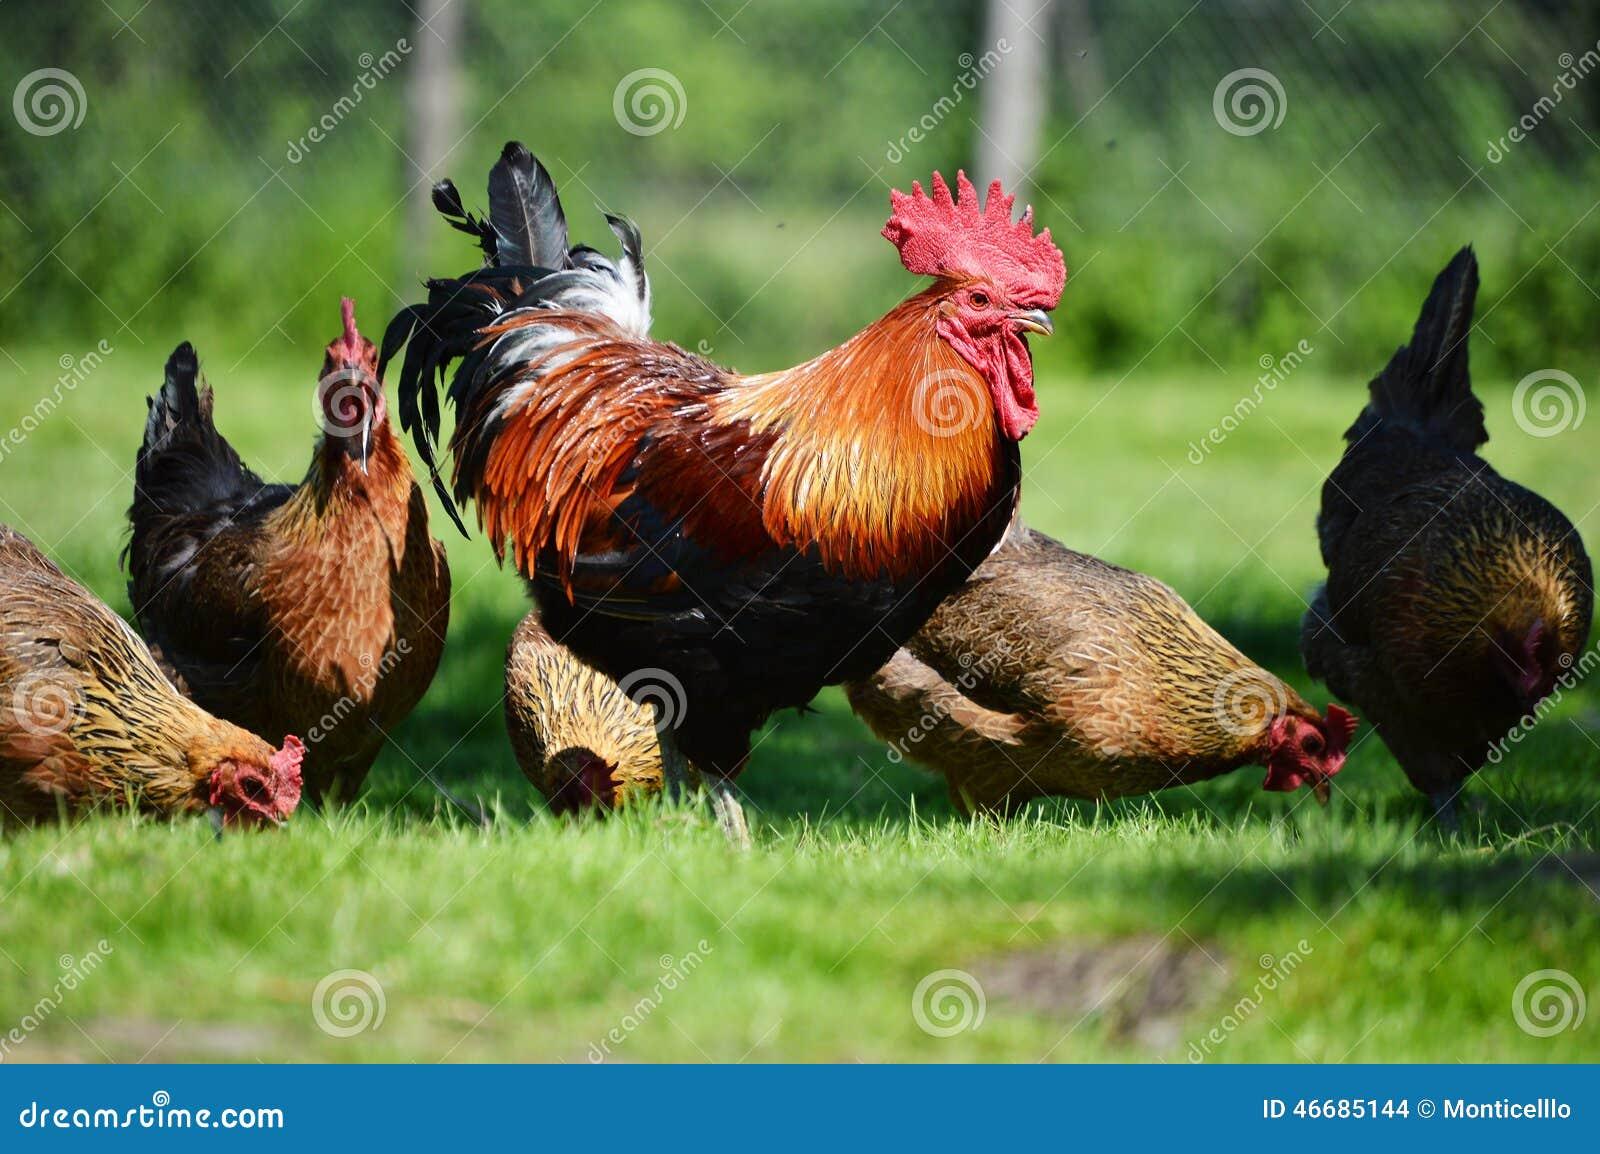 Starting Broiler Poultry Farming Business Plan (PDF)